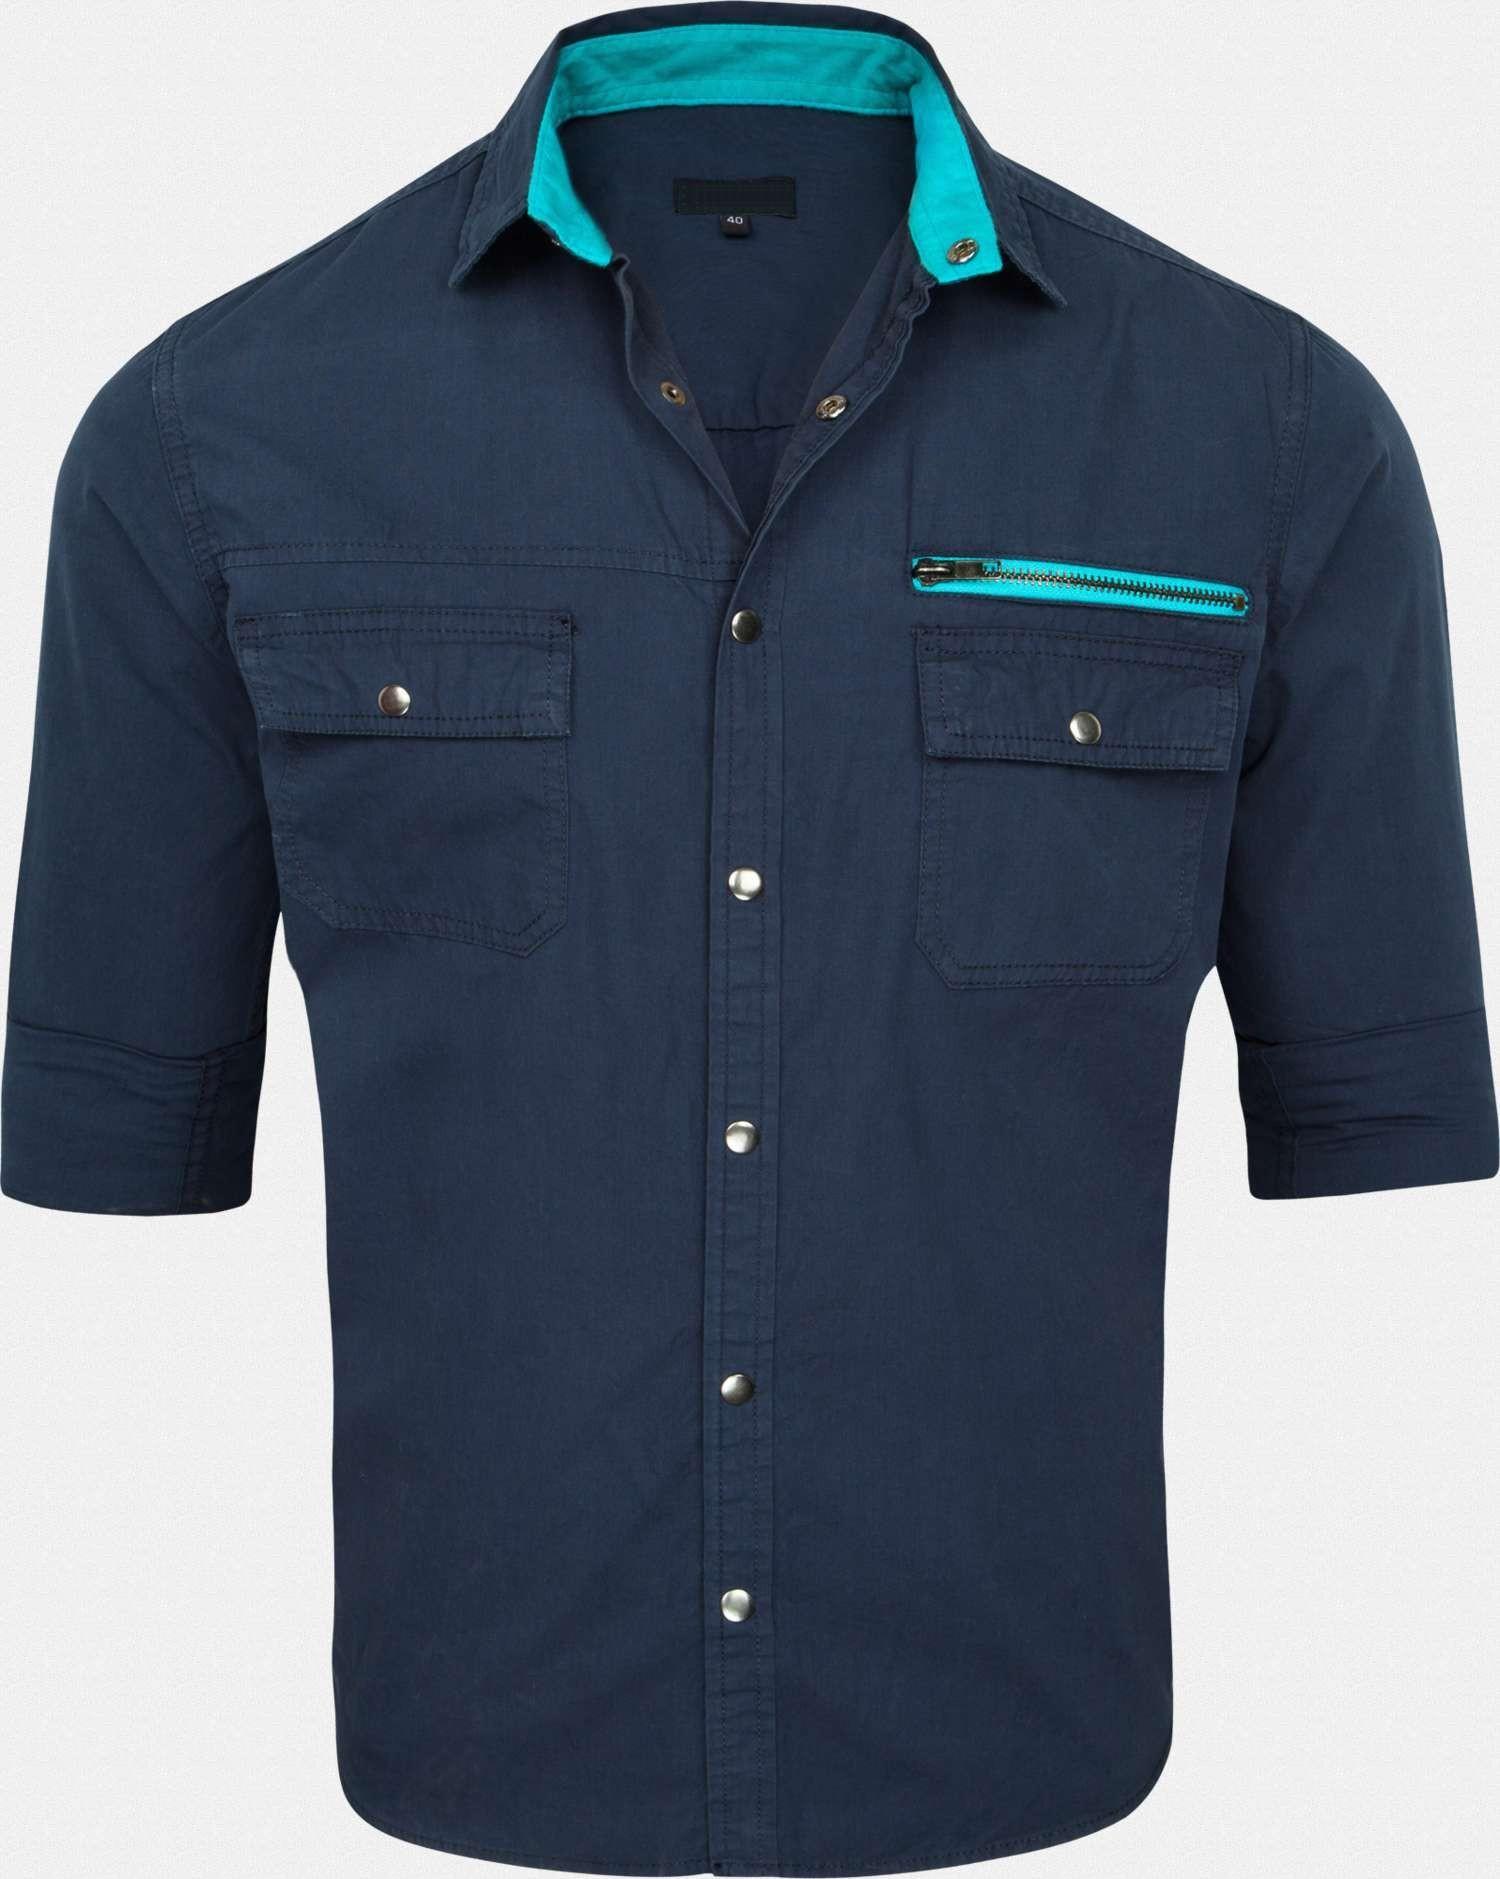 Mens Casual Cotton Blue Shirt